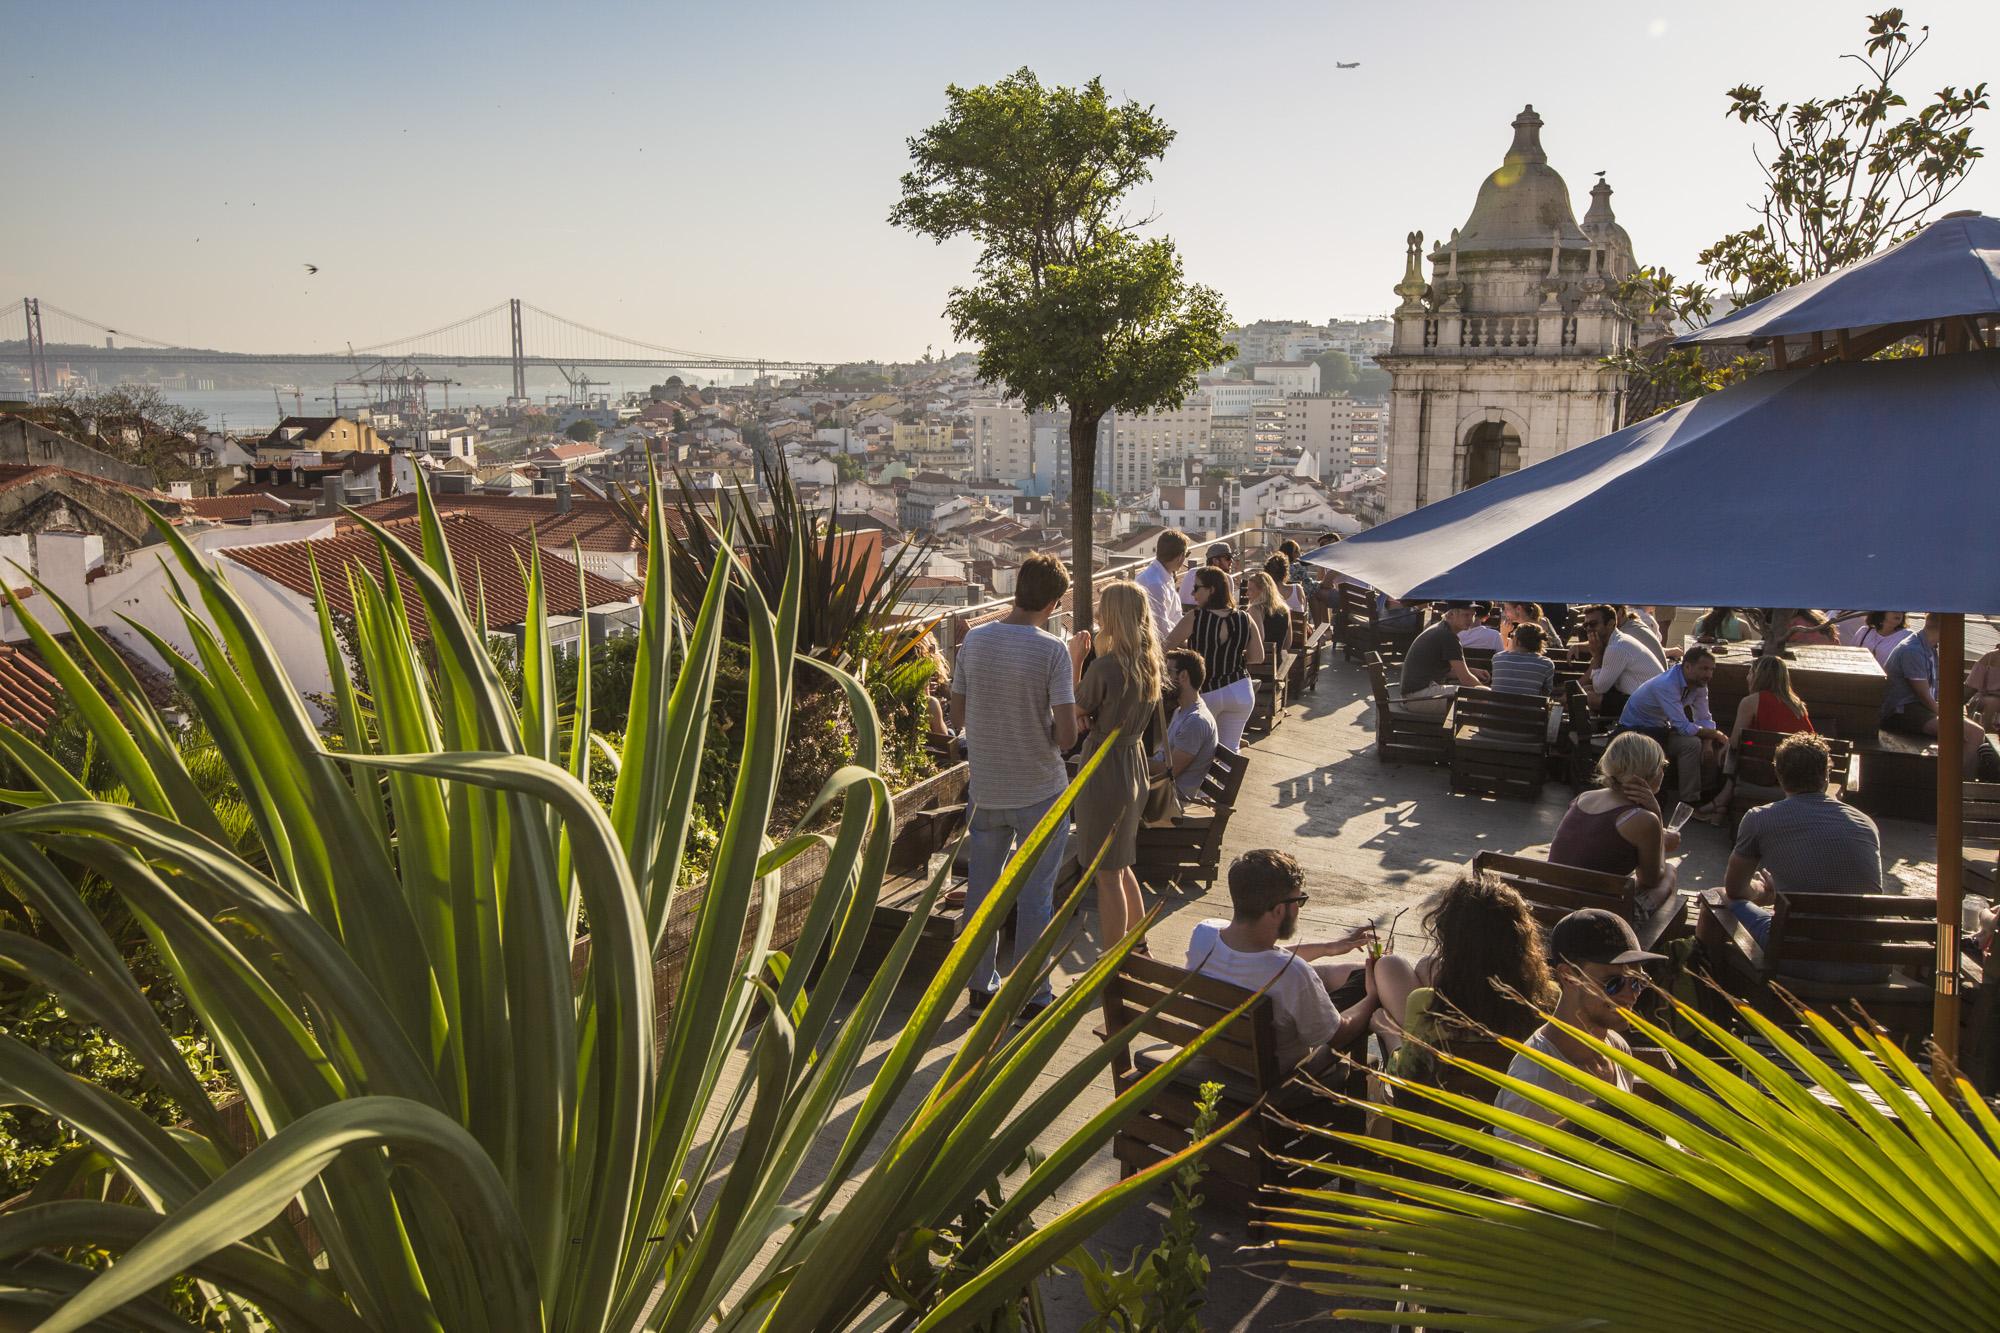 Portugal, Lissabon, Bairro Alto, Calcada do Combro, Park Rooftopbar auf dem Dach eines Parkhauses